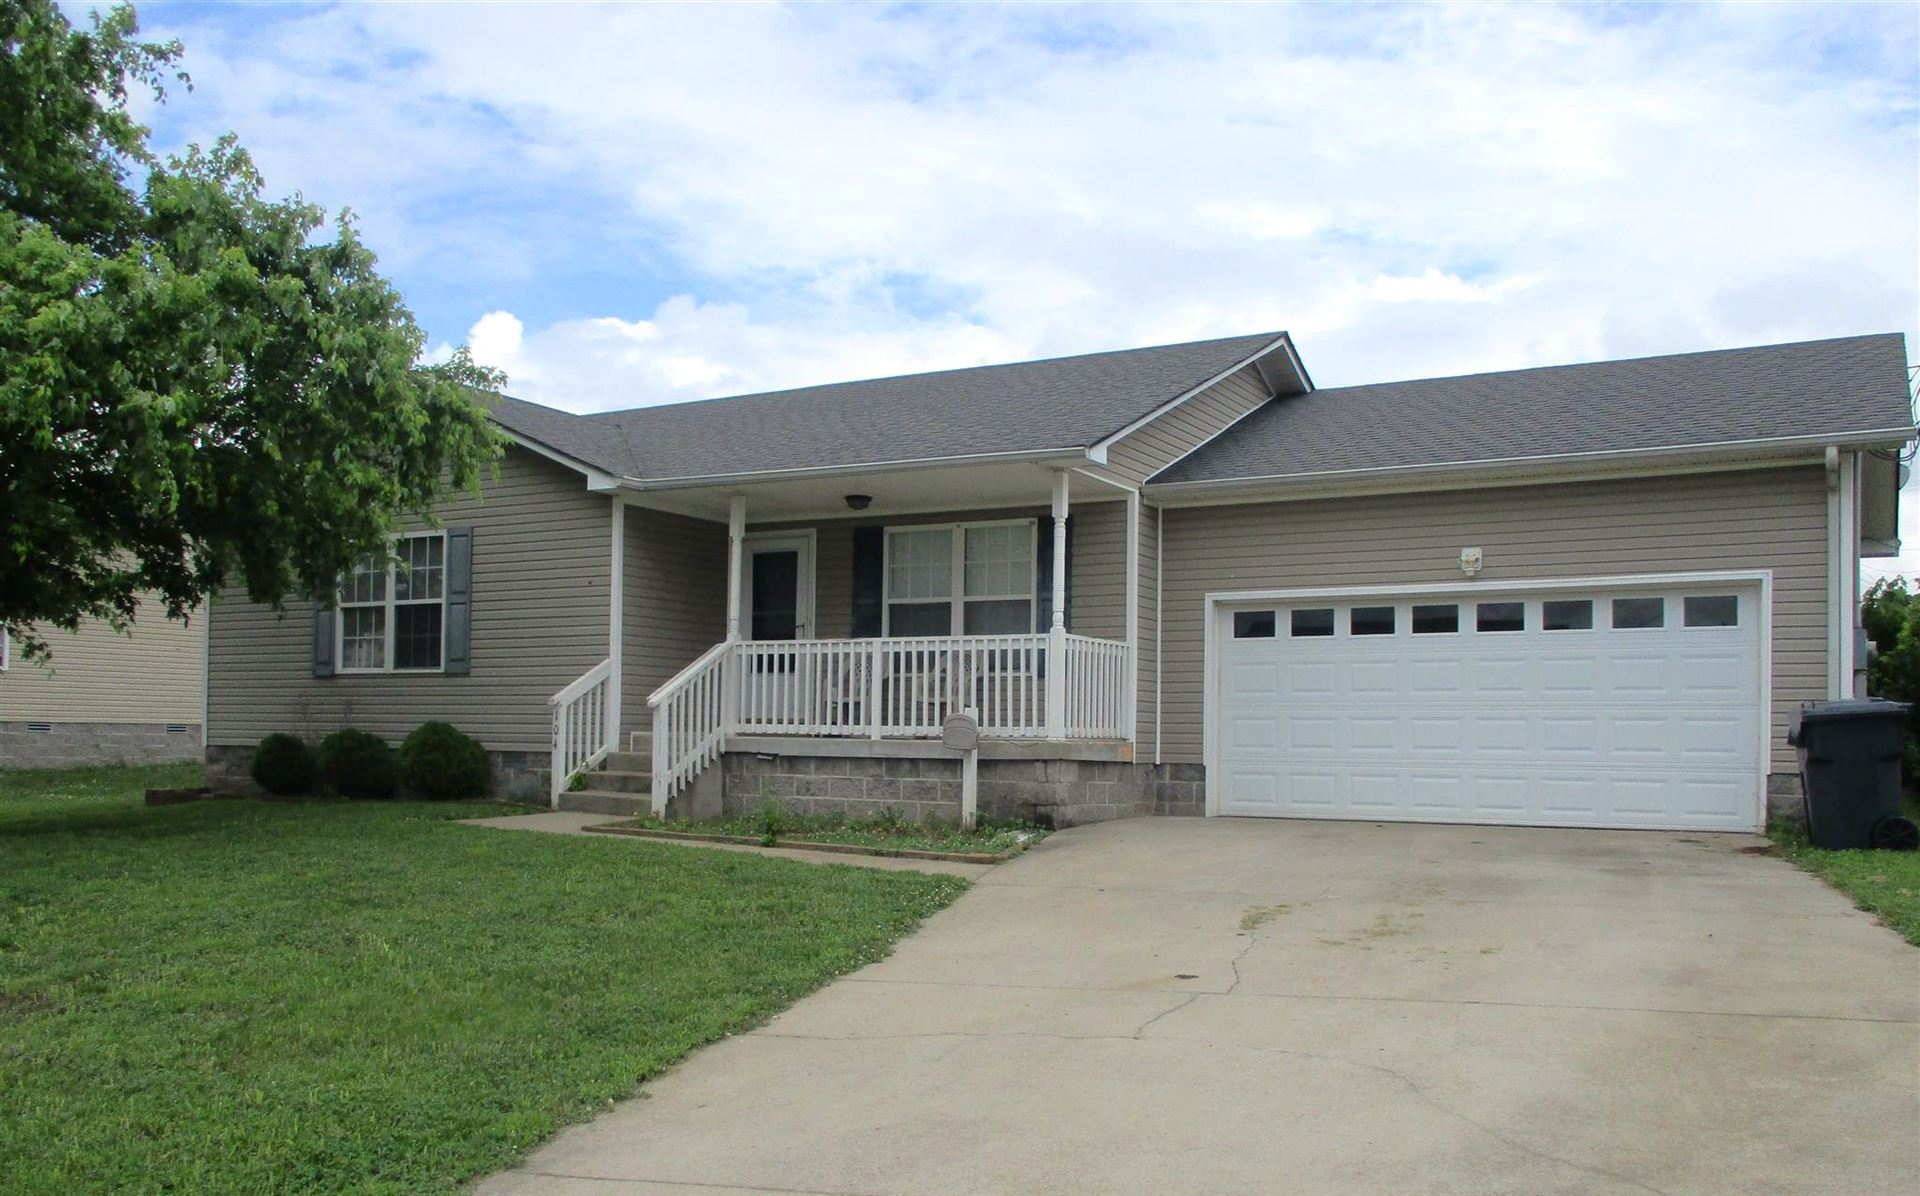 104 Meridians Way, Oak Grove, KY 42262 - MLS#: 2245755